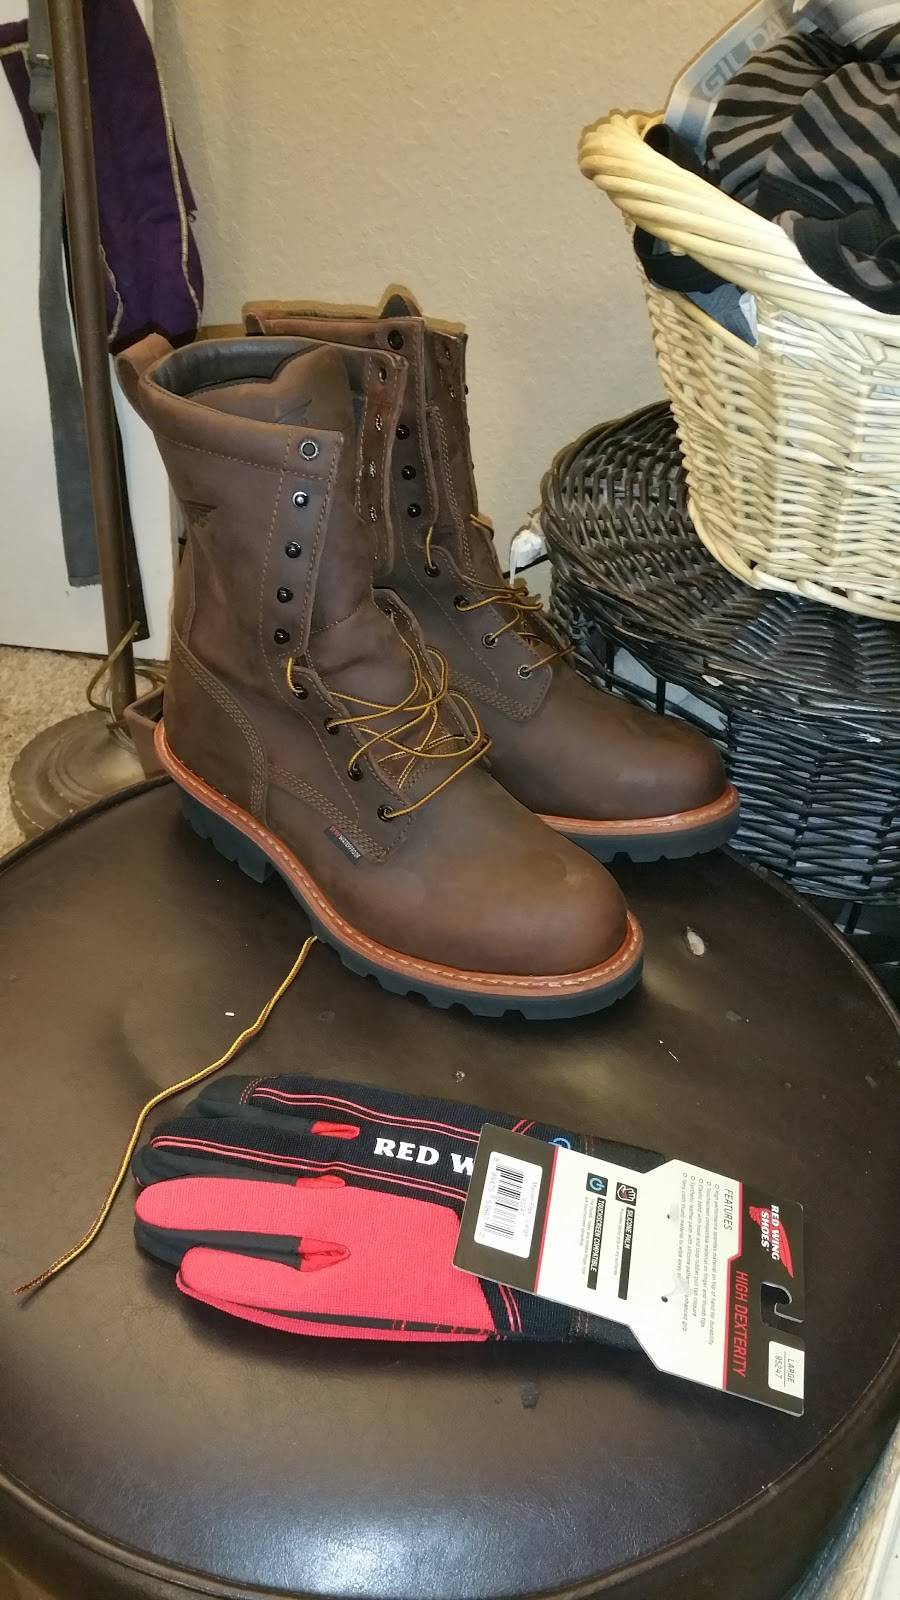 Red Wing - shoe store    Photo 3 of 4   Address: 9538 N Garnett Rd Ste 101, Owasso, OK 74055, USA   Phone: (918) 609-6118